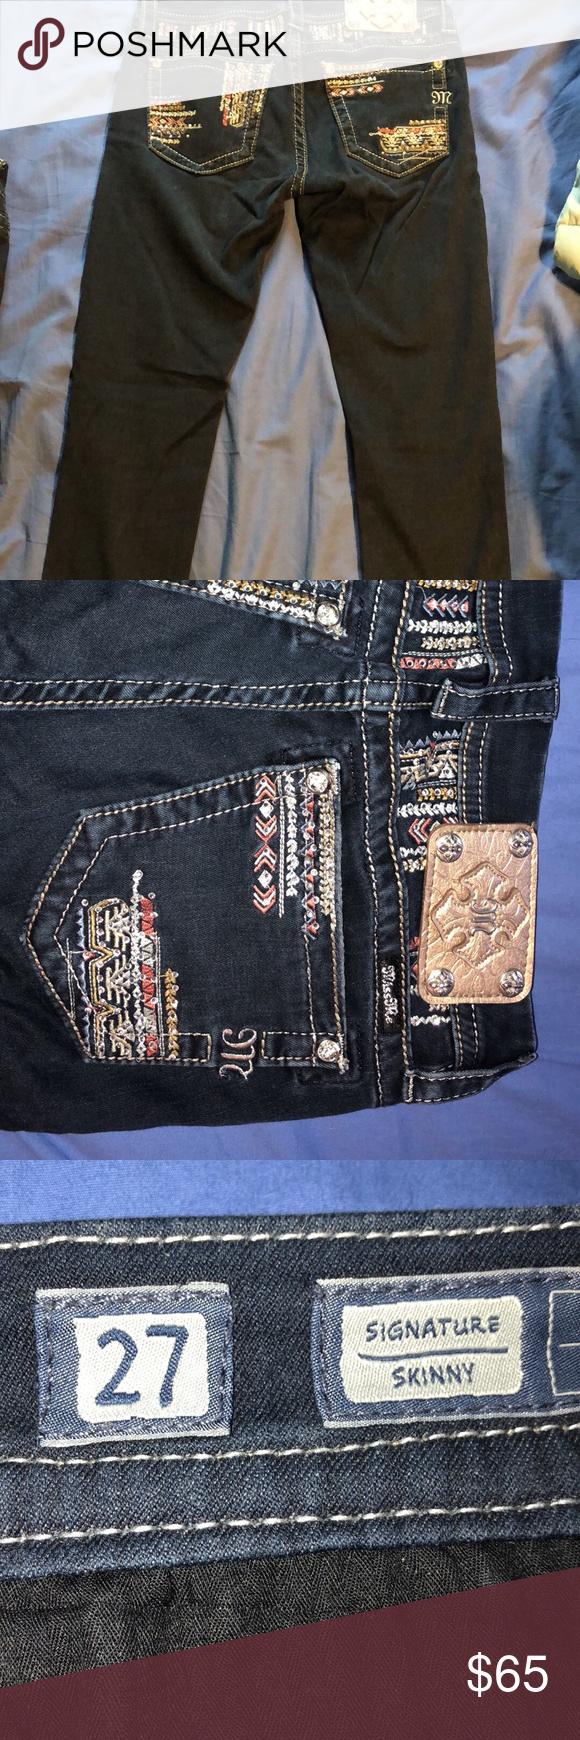 42++ Miss me jeans sizes ideas information